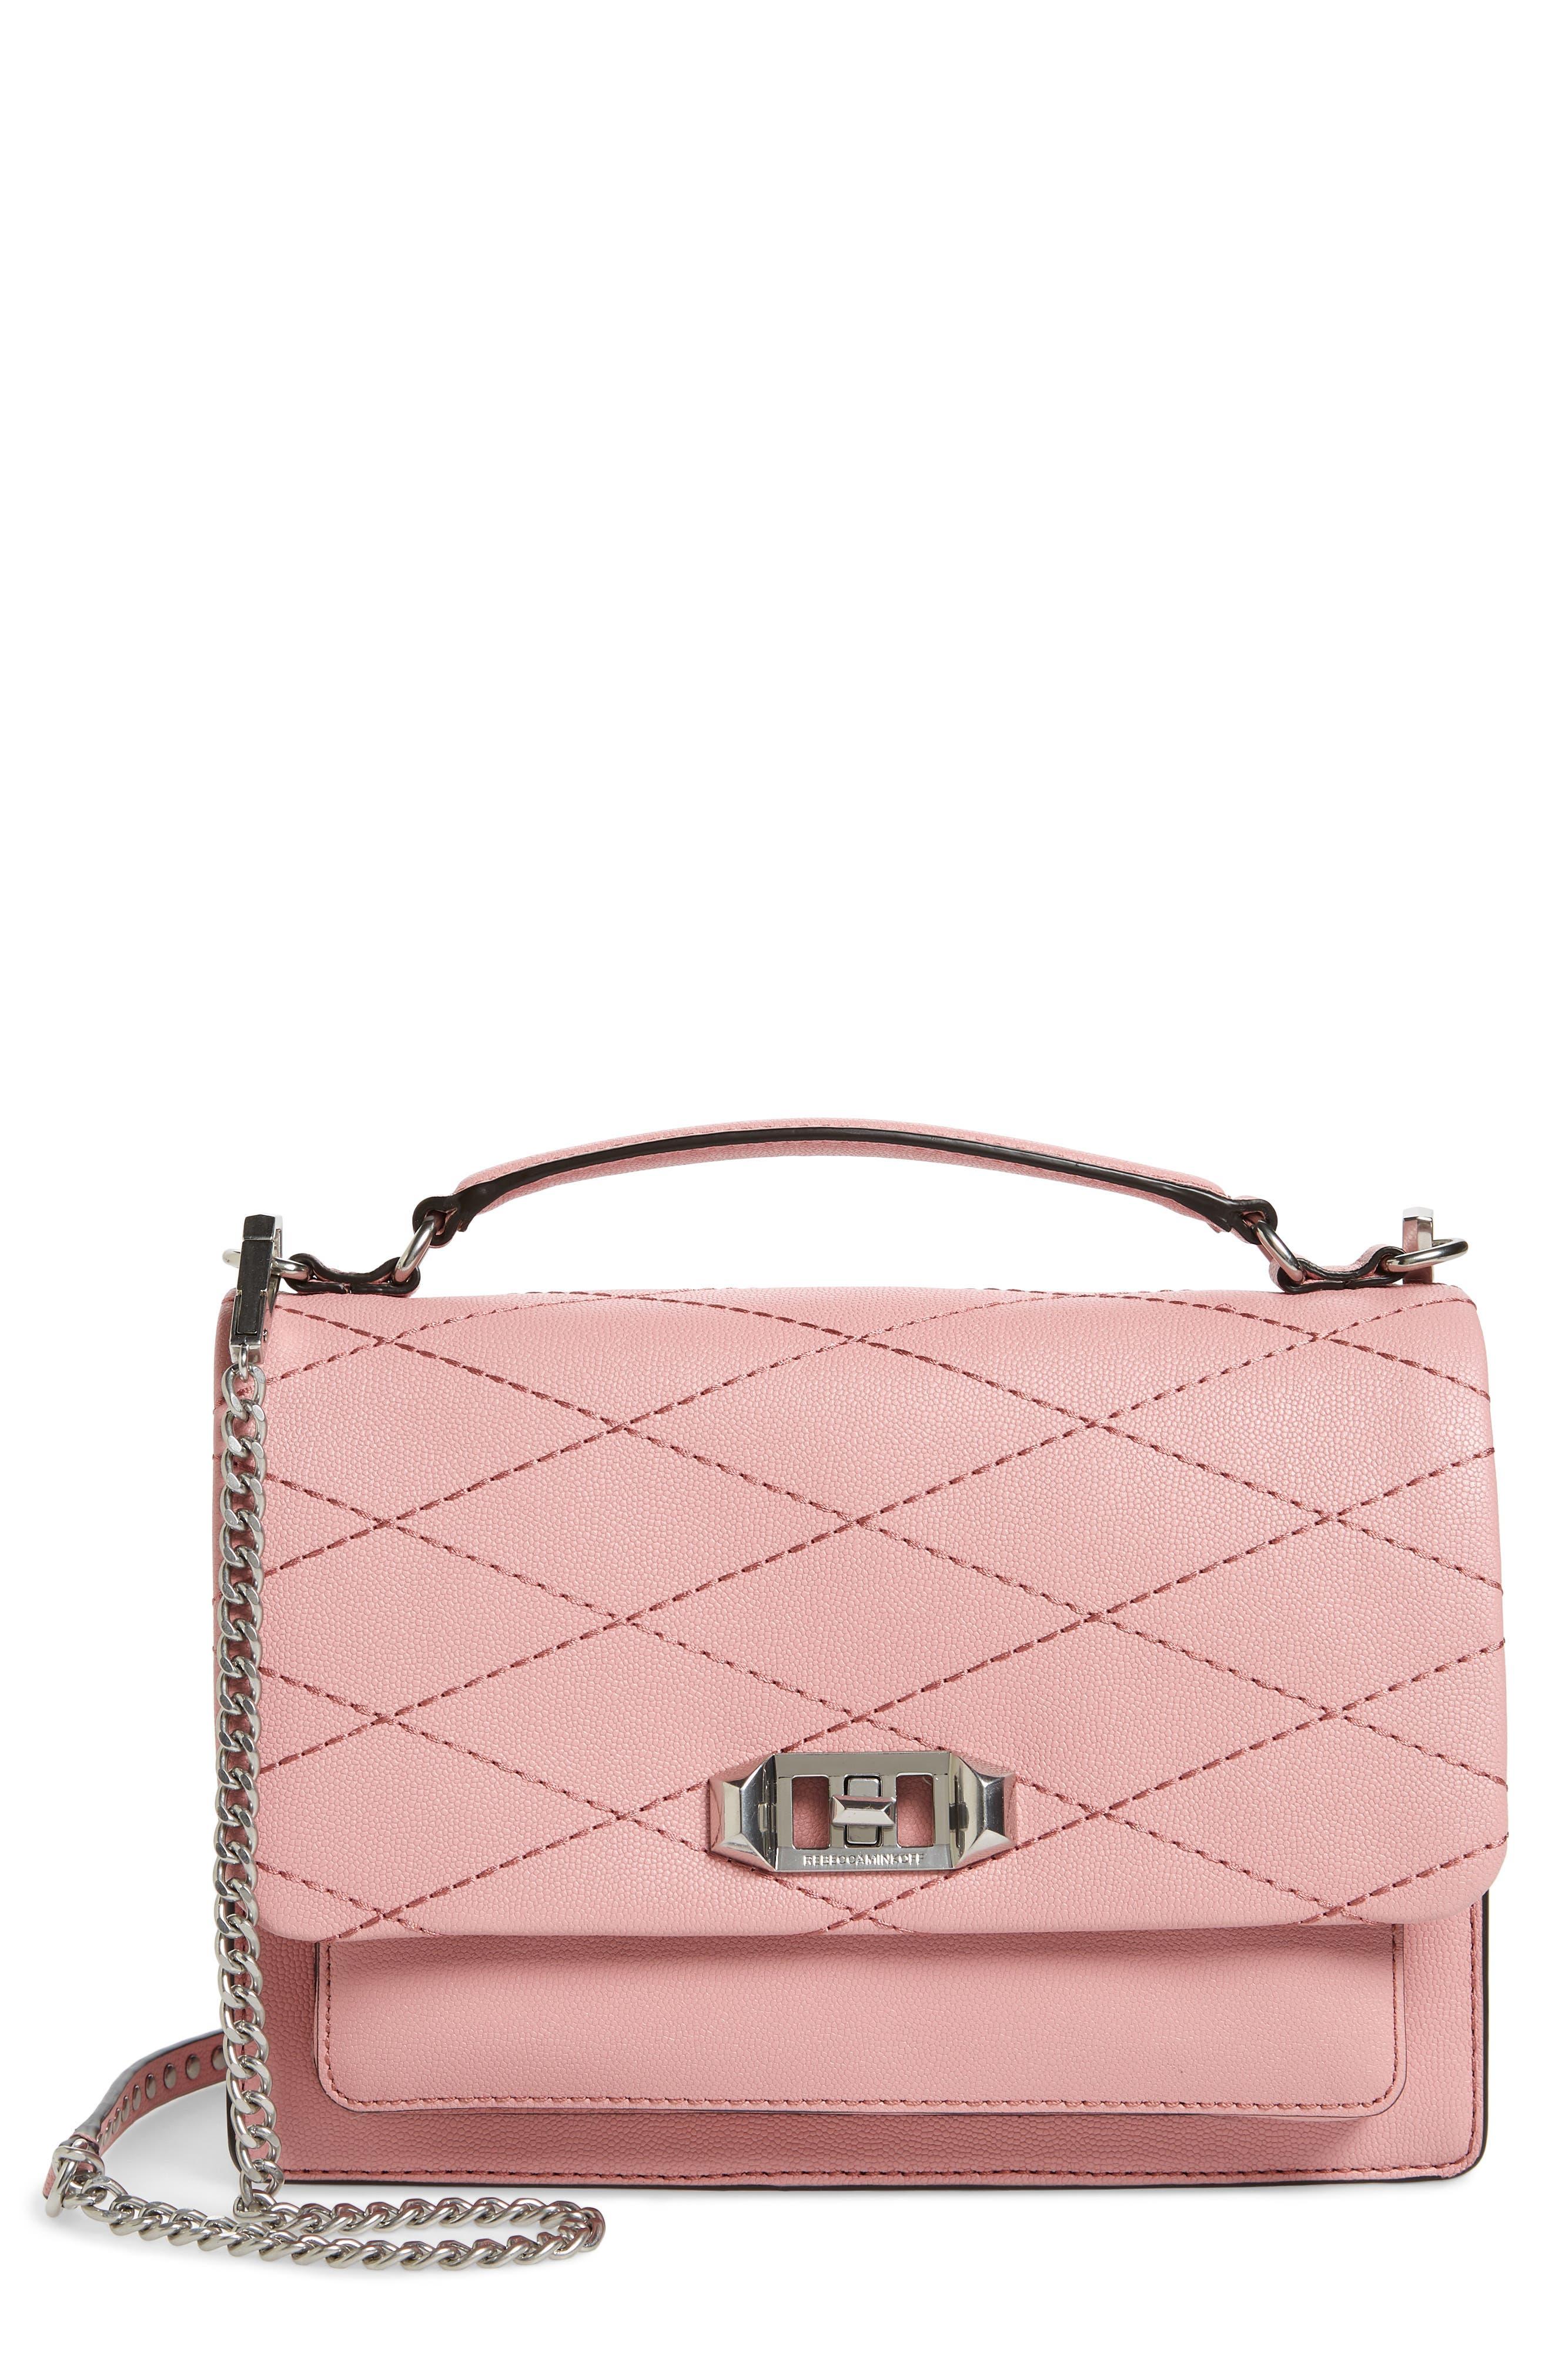 Medium Je T'aime Convertible Leather Crossbody Bag,                             Main thumbnail 9, color,